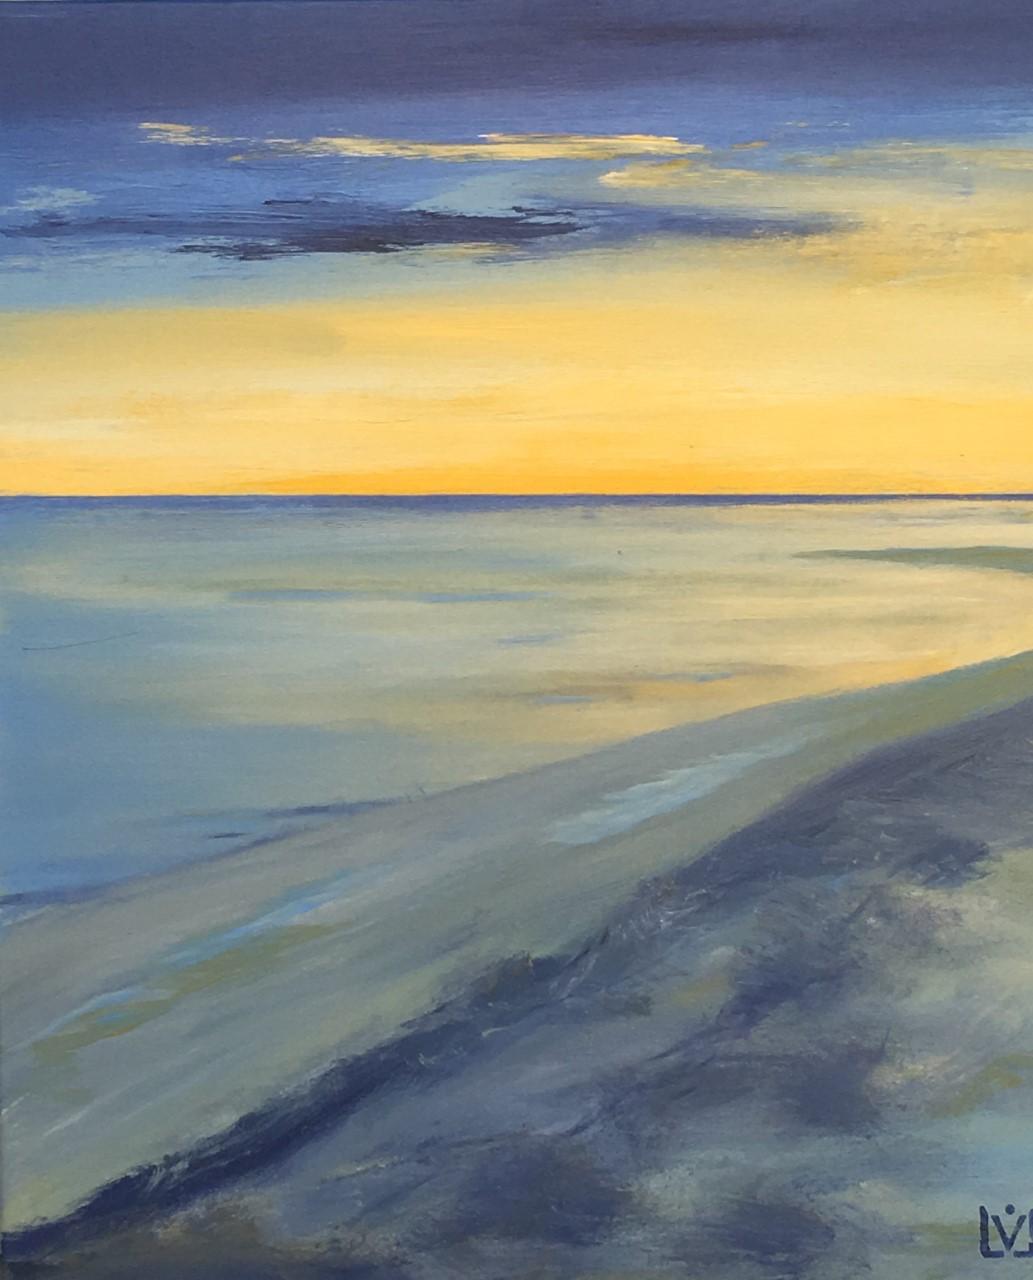 seaside No 3   70 x 60 cm   Acryl auf Leinwand